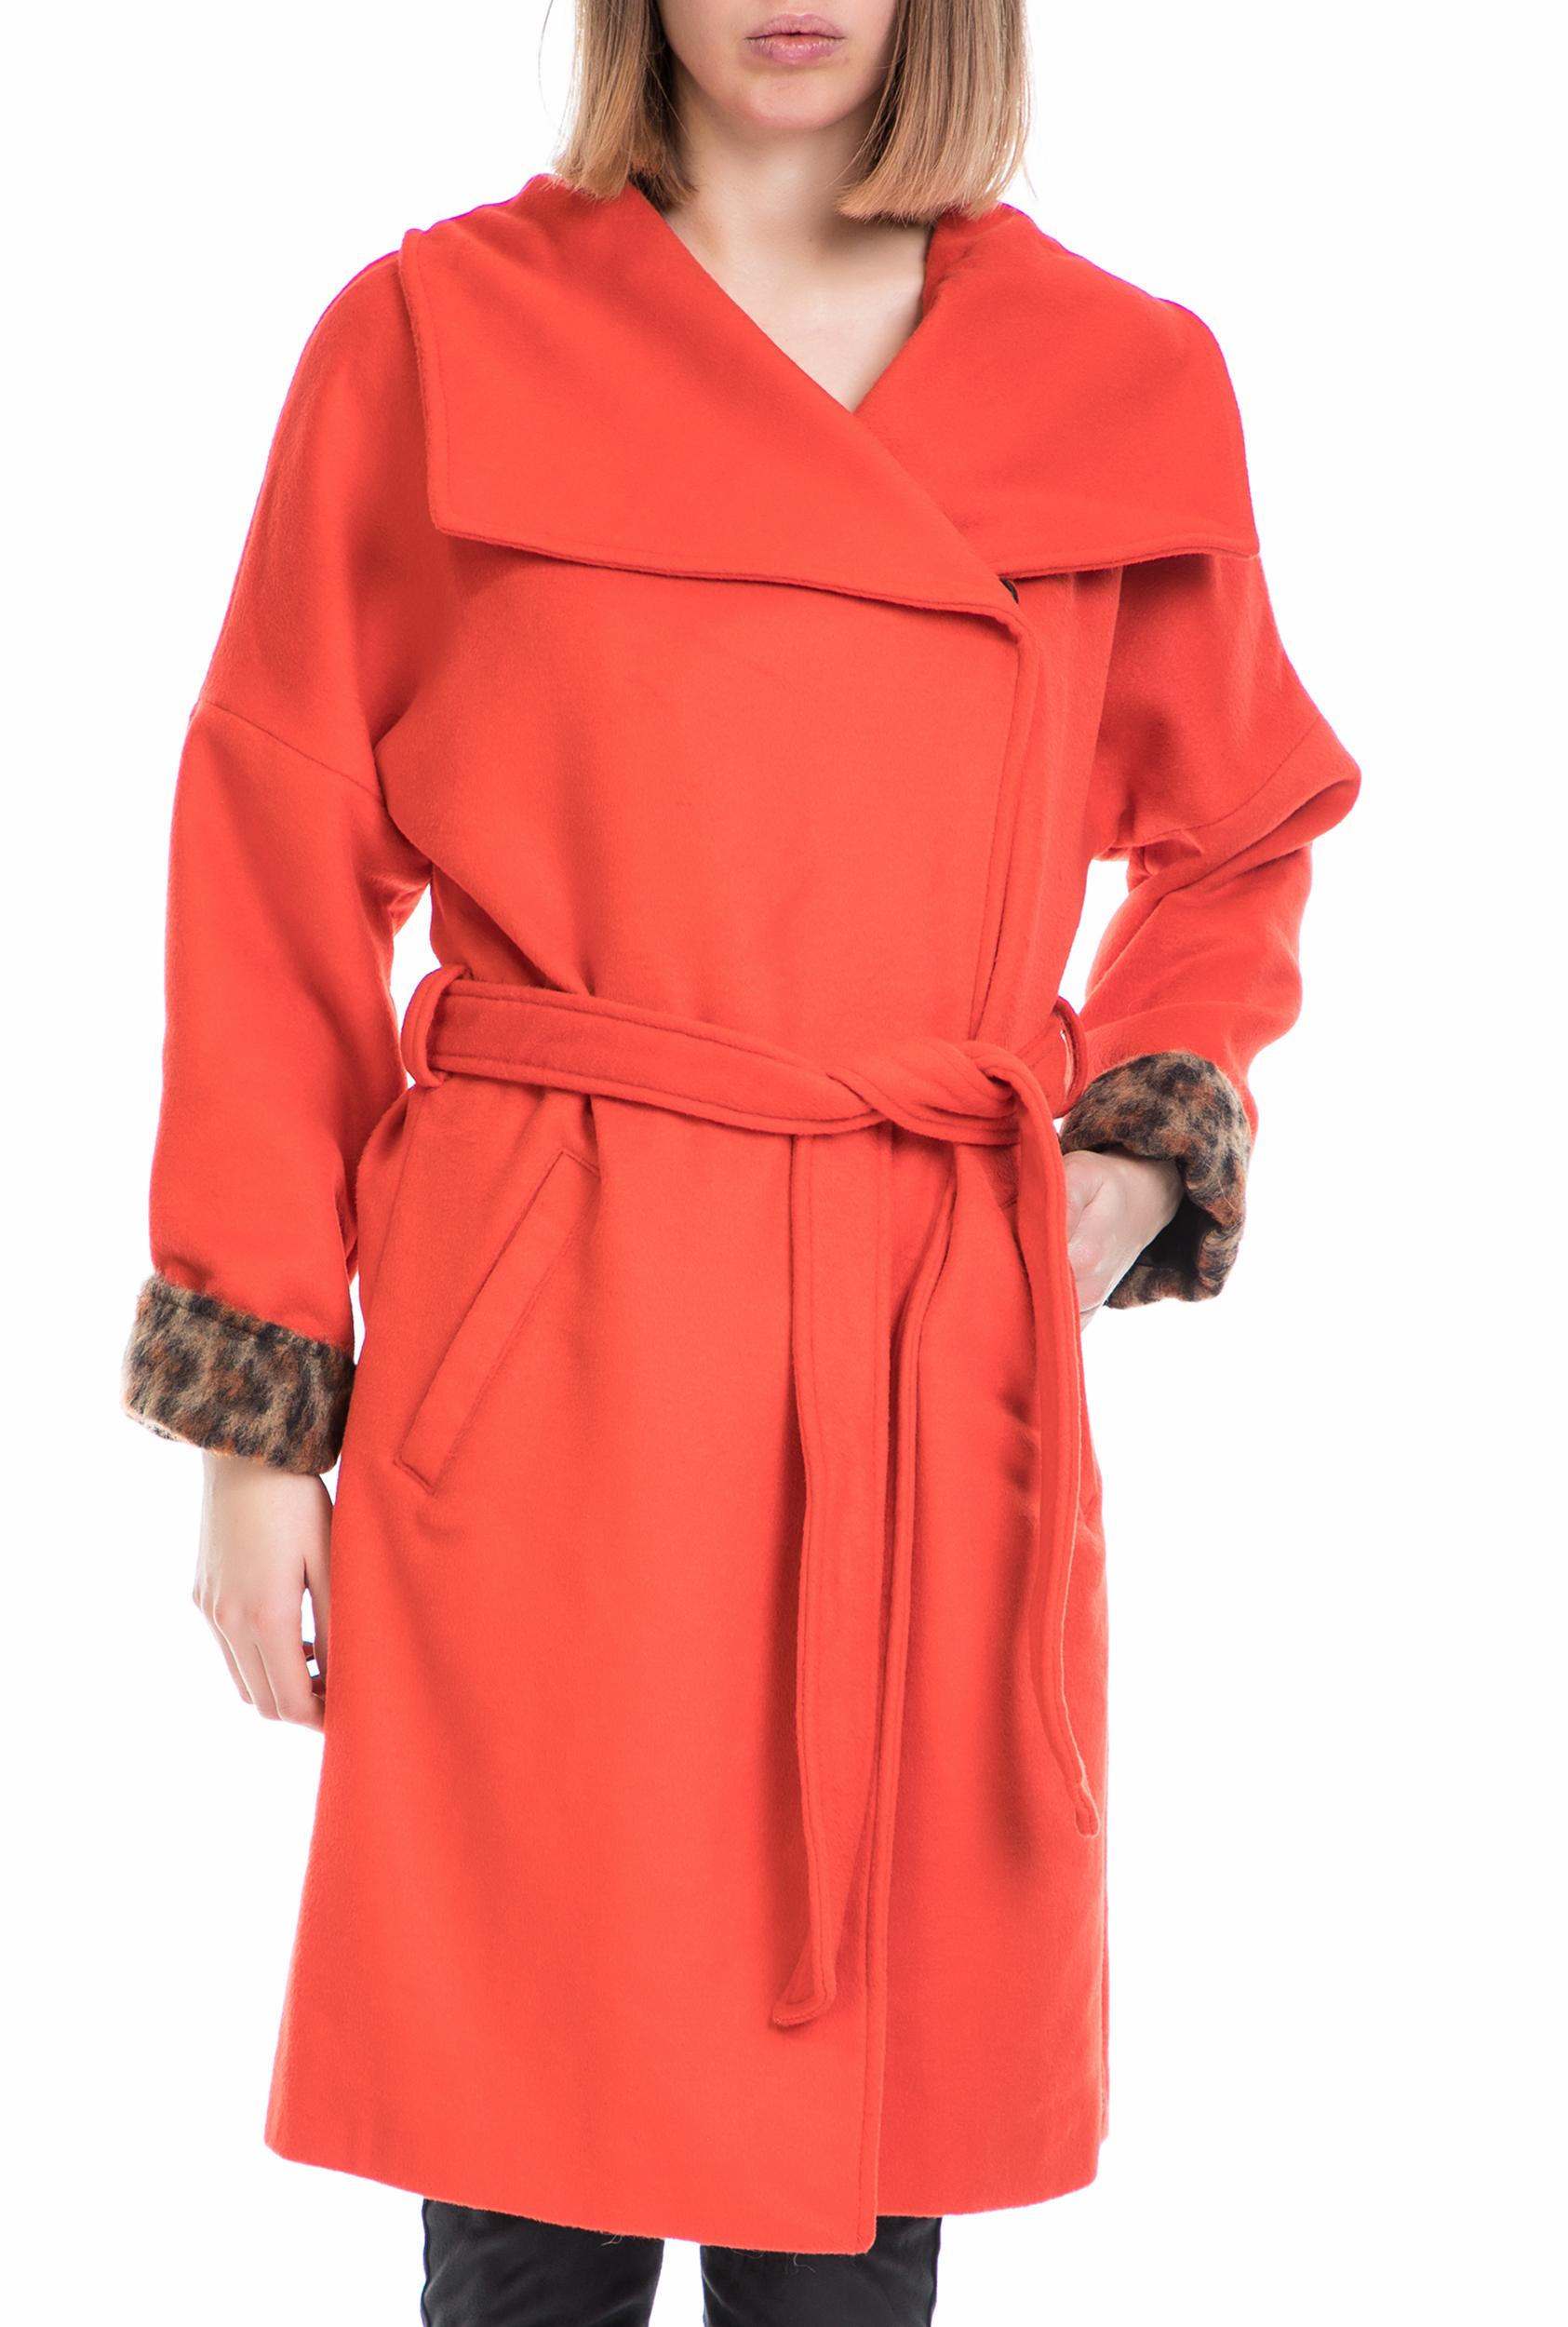 SCOTCH & SODA - Γυναικείο παλτό SCOTCH & SODA κόκκινο γυναικεία ρούχα πανωφόρια παλτό